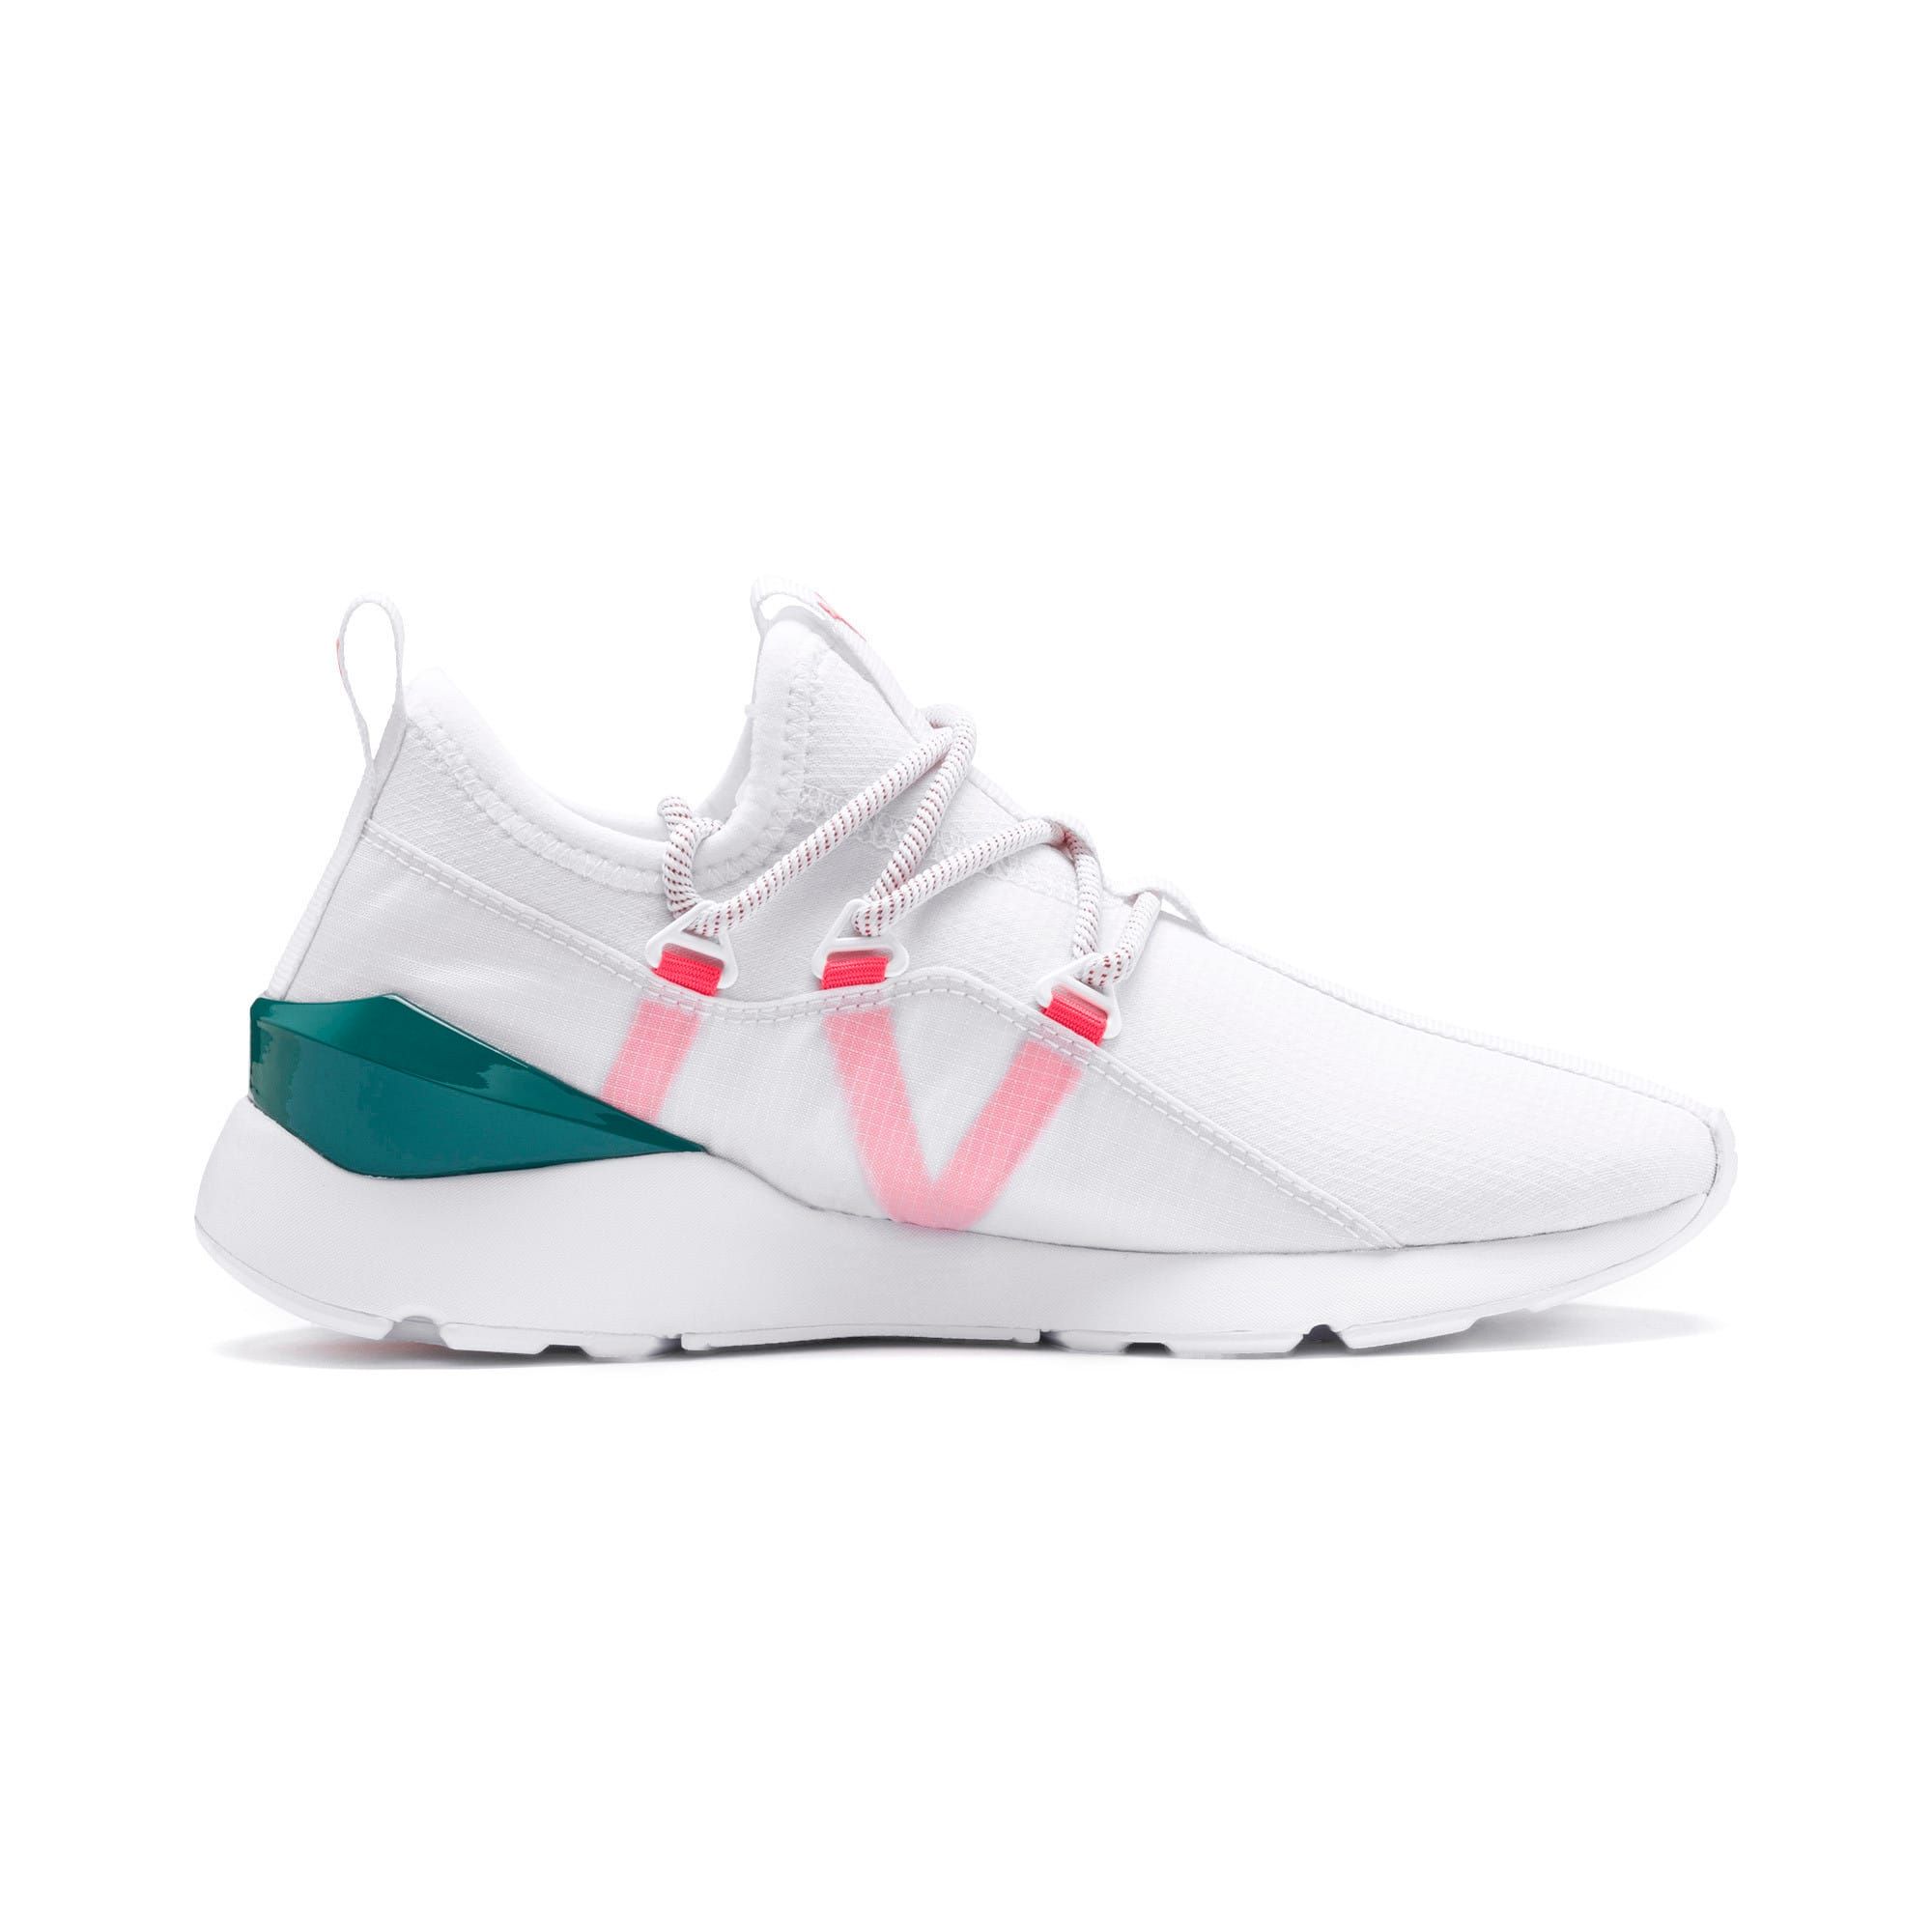 Thumbnail 6 of Muse 2 Hypertech Women's Sneakers, Puma White-Pink Alert, medium